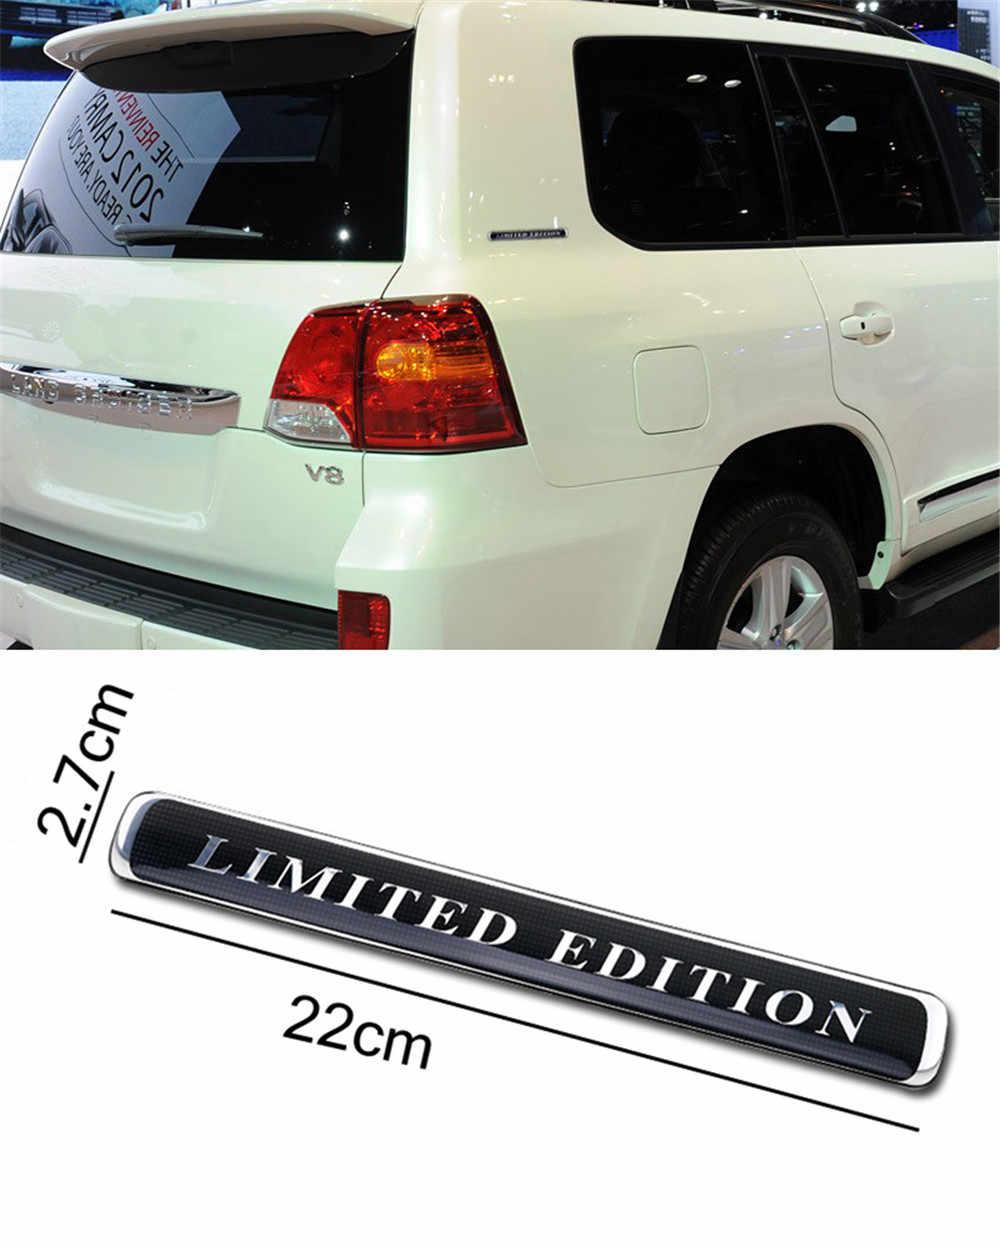 Commemorative Limited Edition Logo Car Body Sticker For Toyota Land Cruiser 200 Fj Cruiser Luxury Suv Auto Trunk Side Emblem Car Stickers Aliexpress